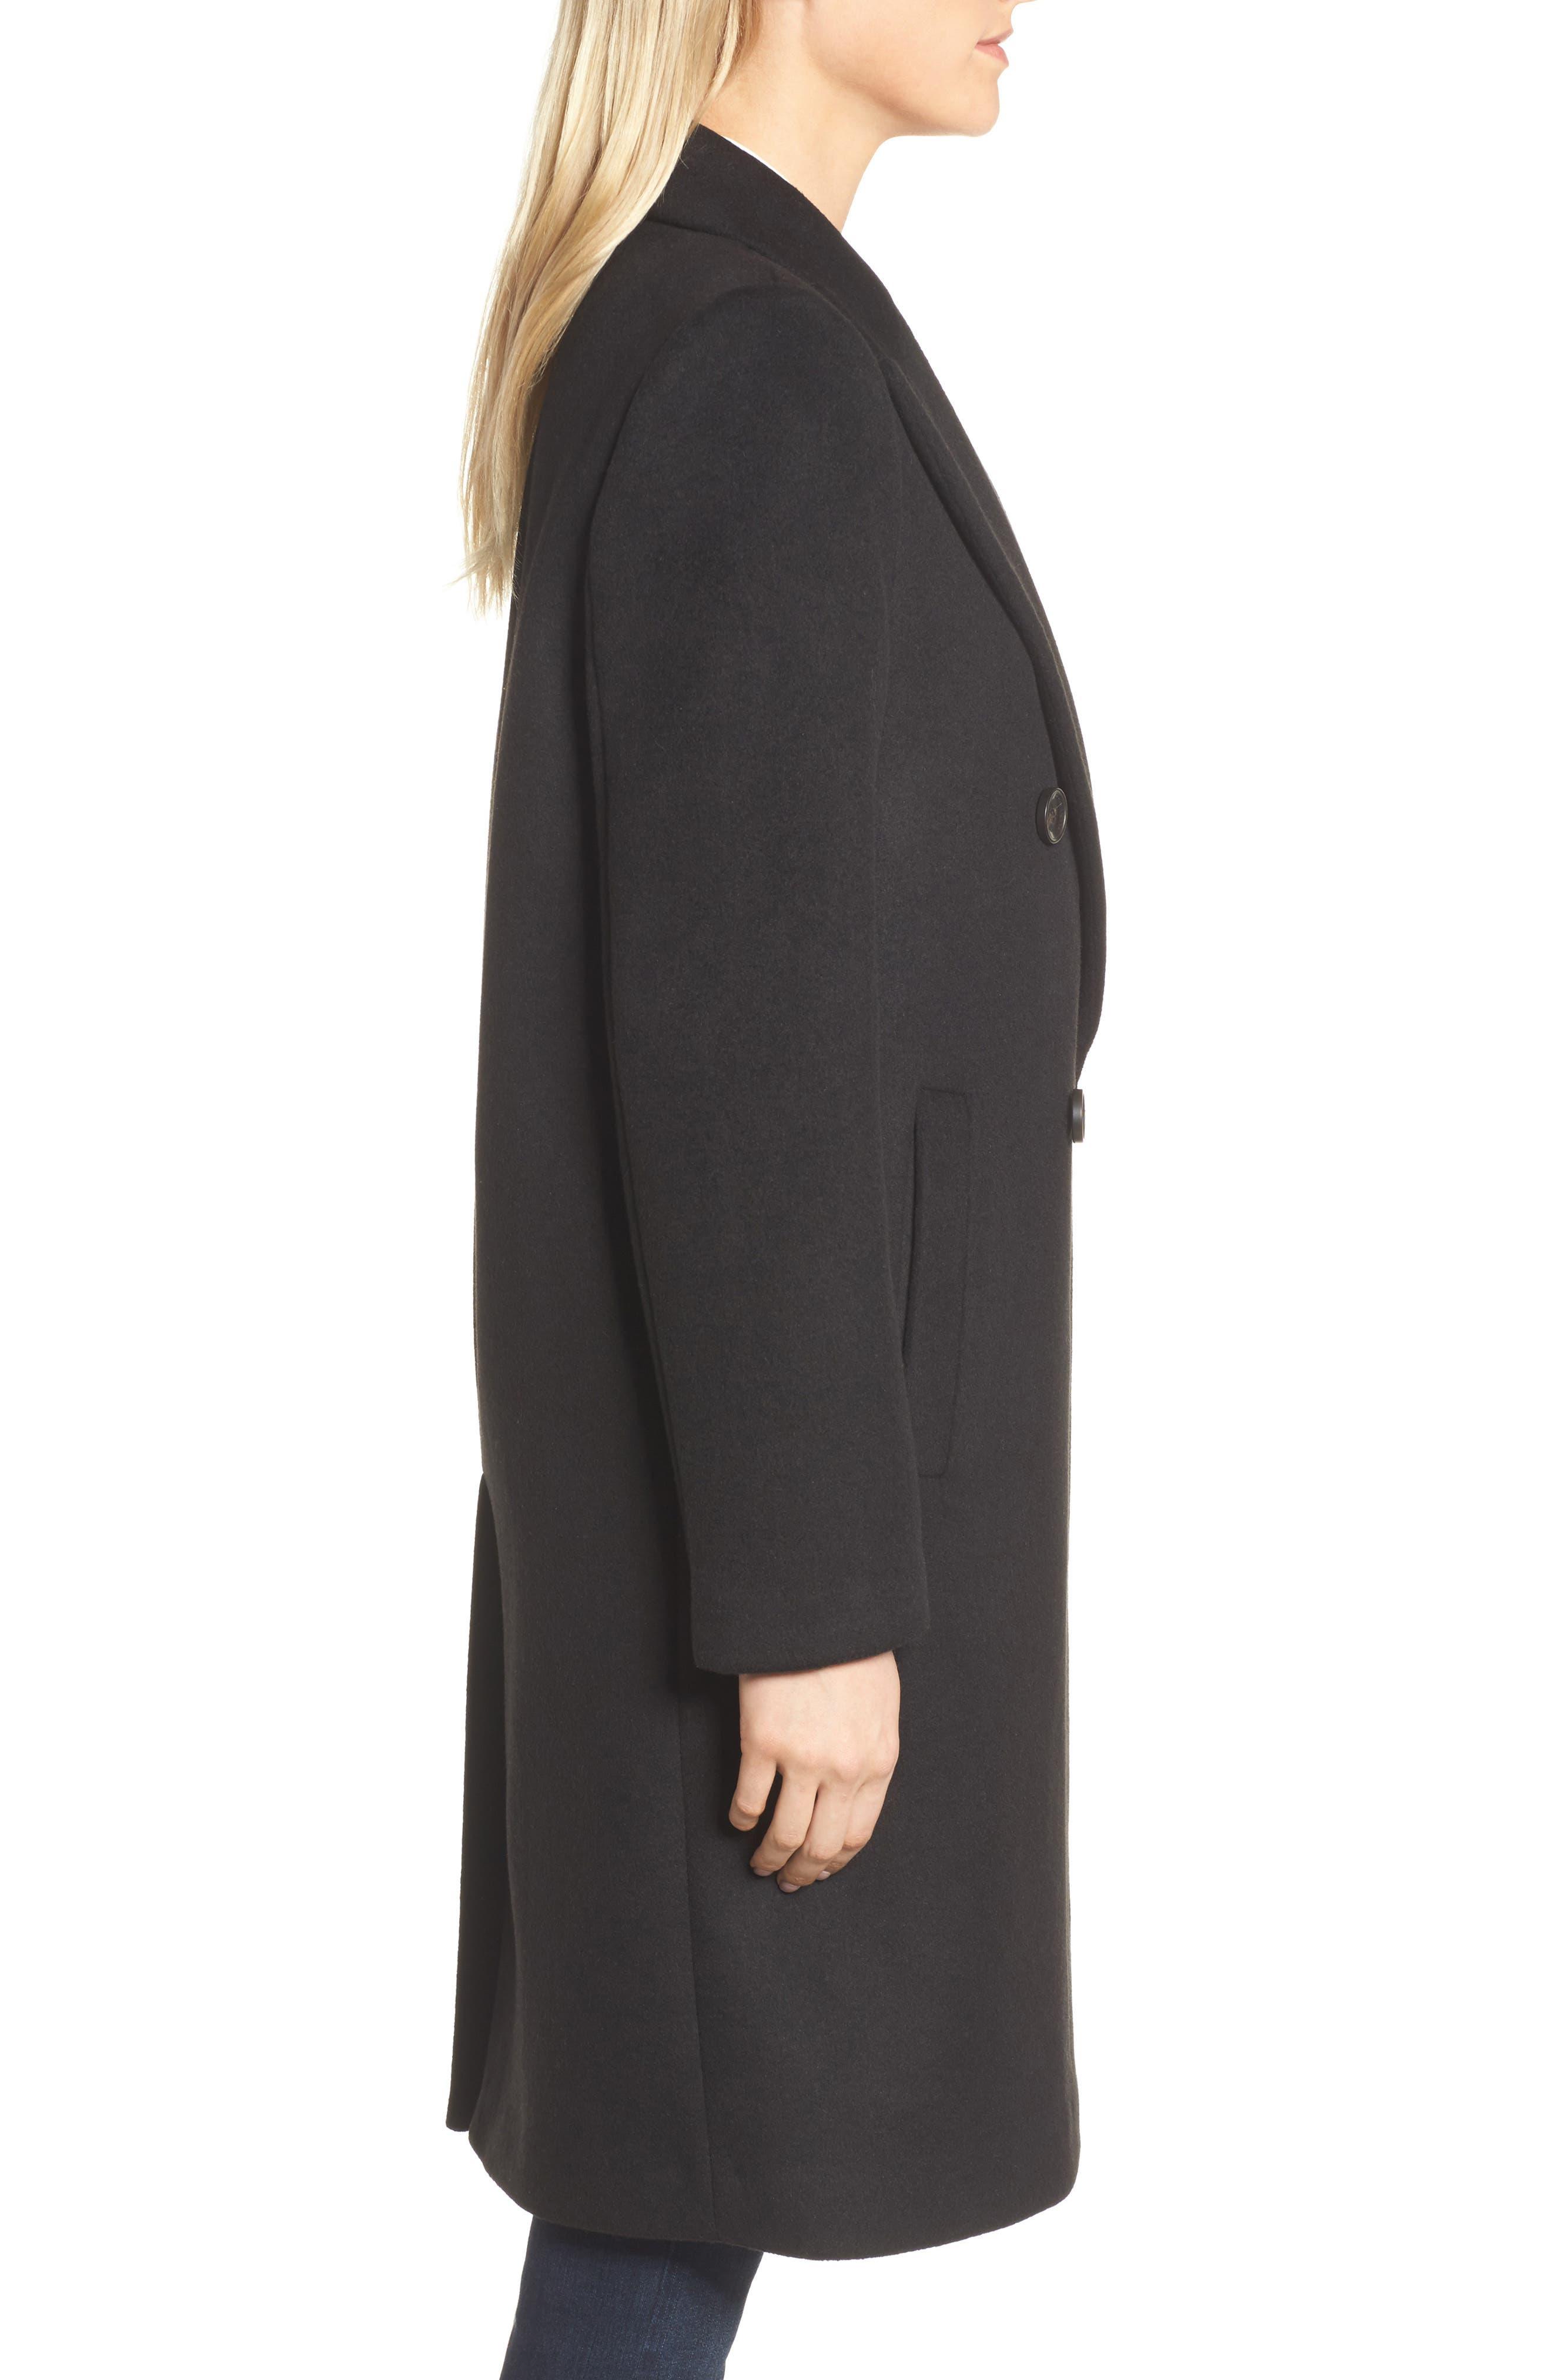 DKNY Lavish Wool Blend Coat,                             Alternate thumbnail 3, color,                             001